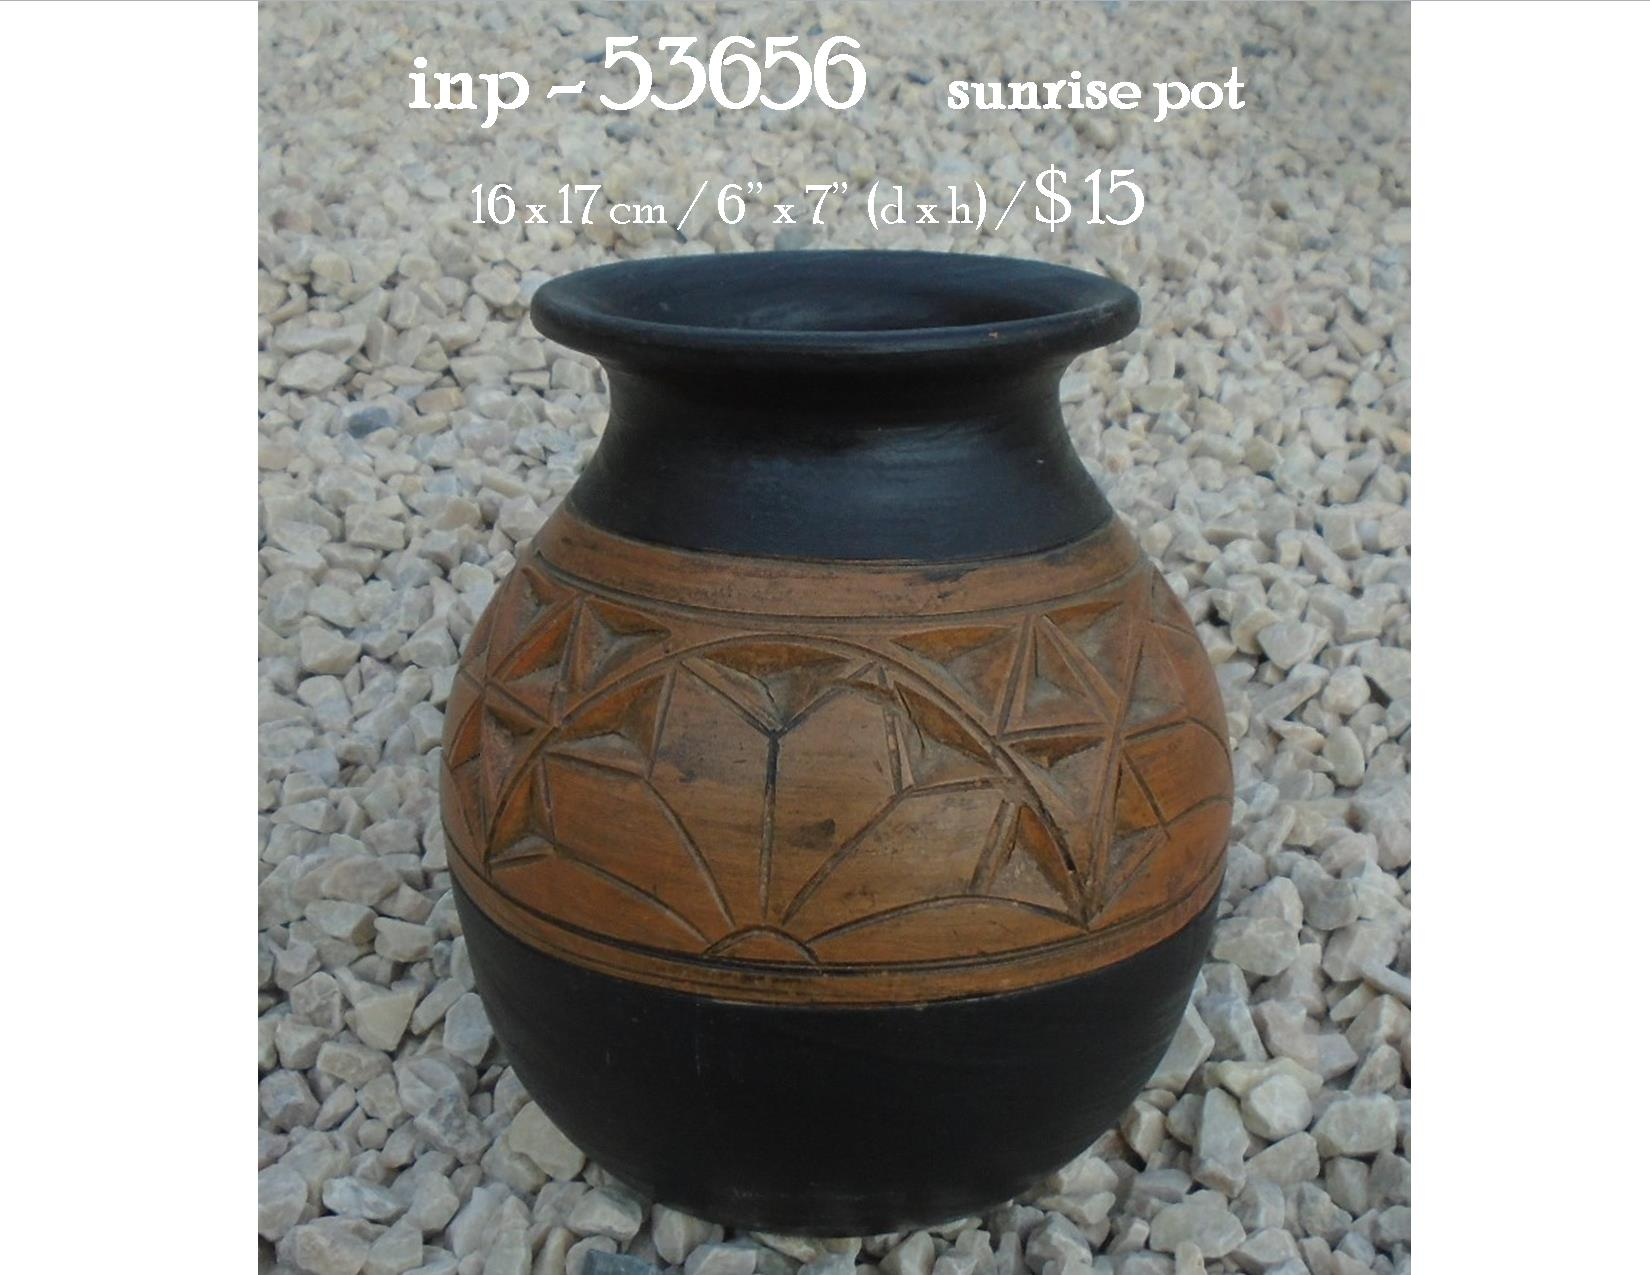 inp - 53656     sunrise pot